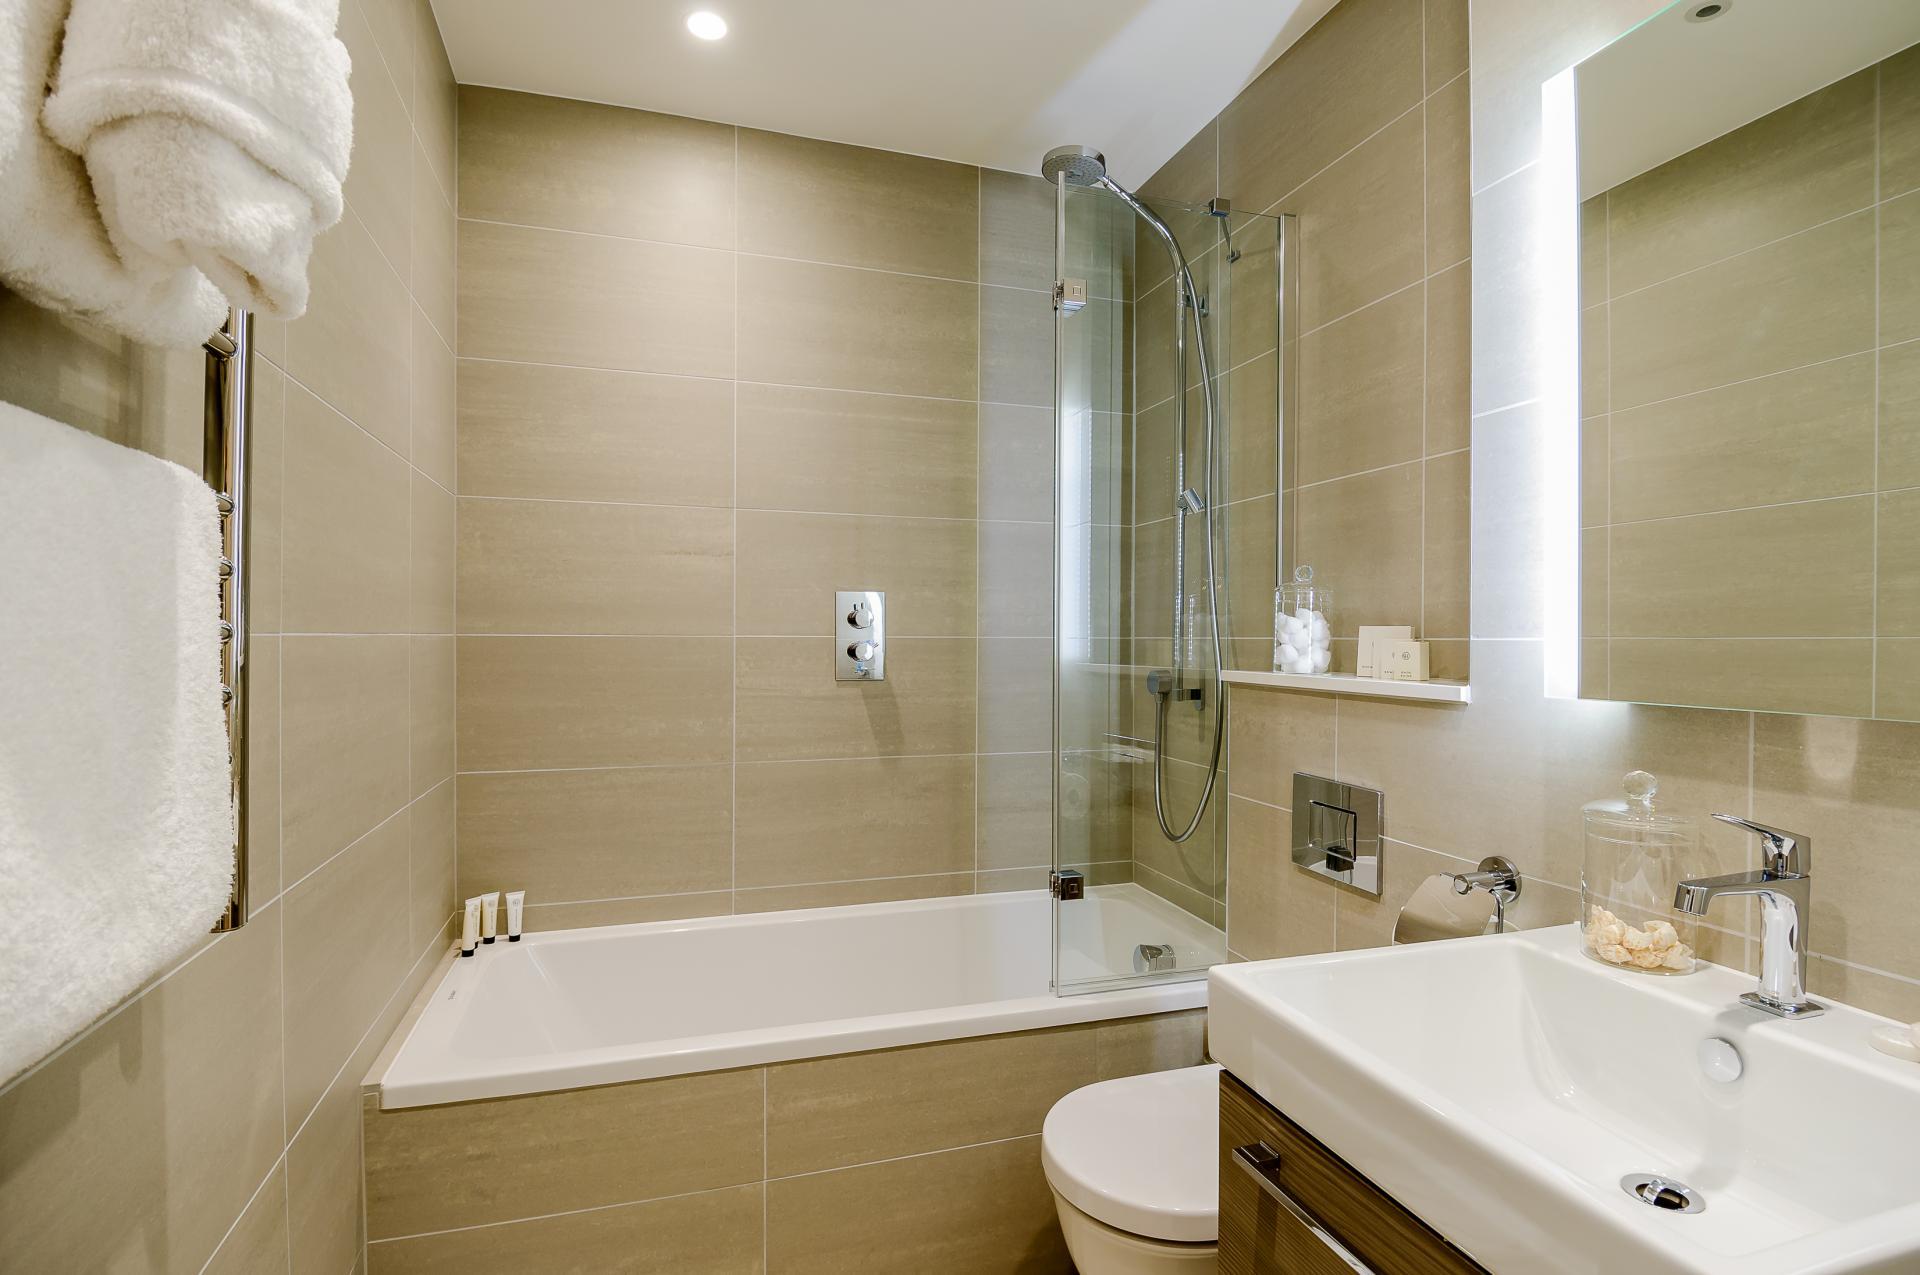 Bathroom at LAK Serviced Apartments, Gloucester Road, London - Citybase Apartments